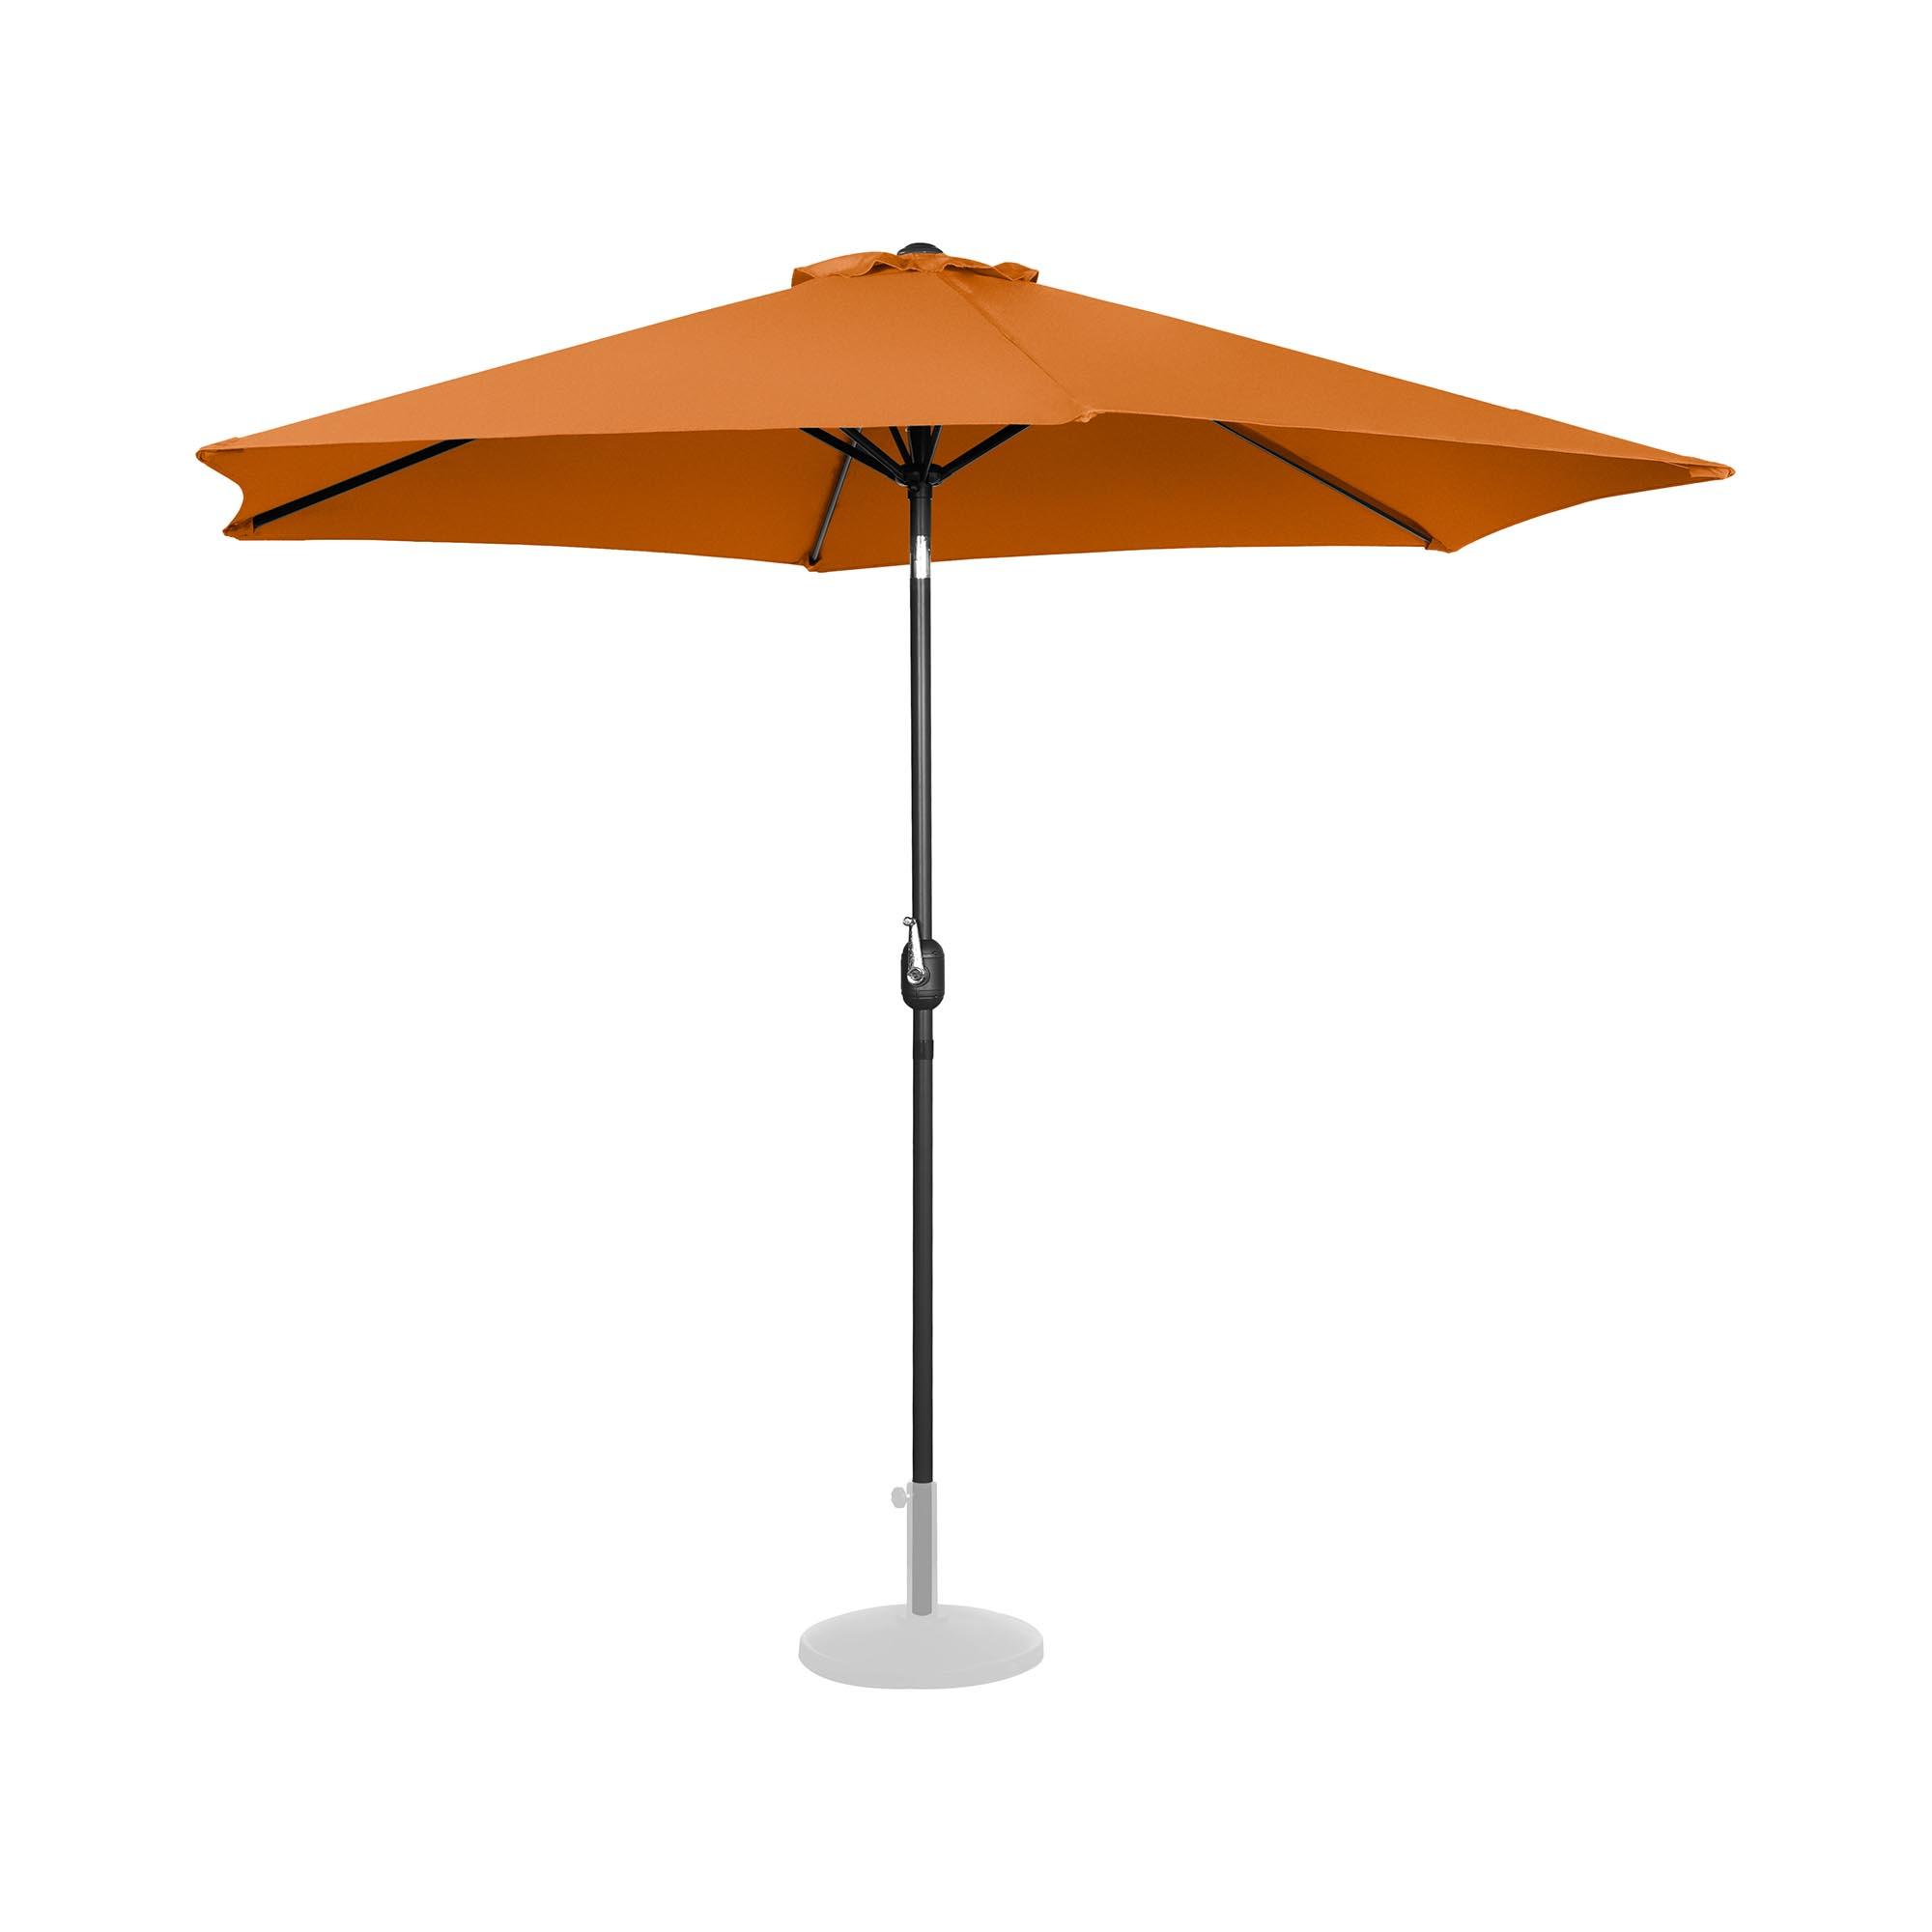 Uniprodo Sonnenschirm groß - orange - sechseckig - Ø 300 cm - neigbar UNI_UMBRELLA_TR300OR